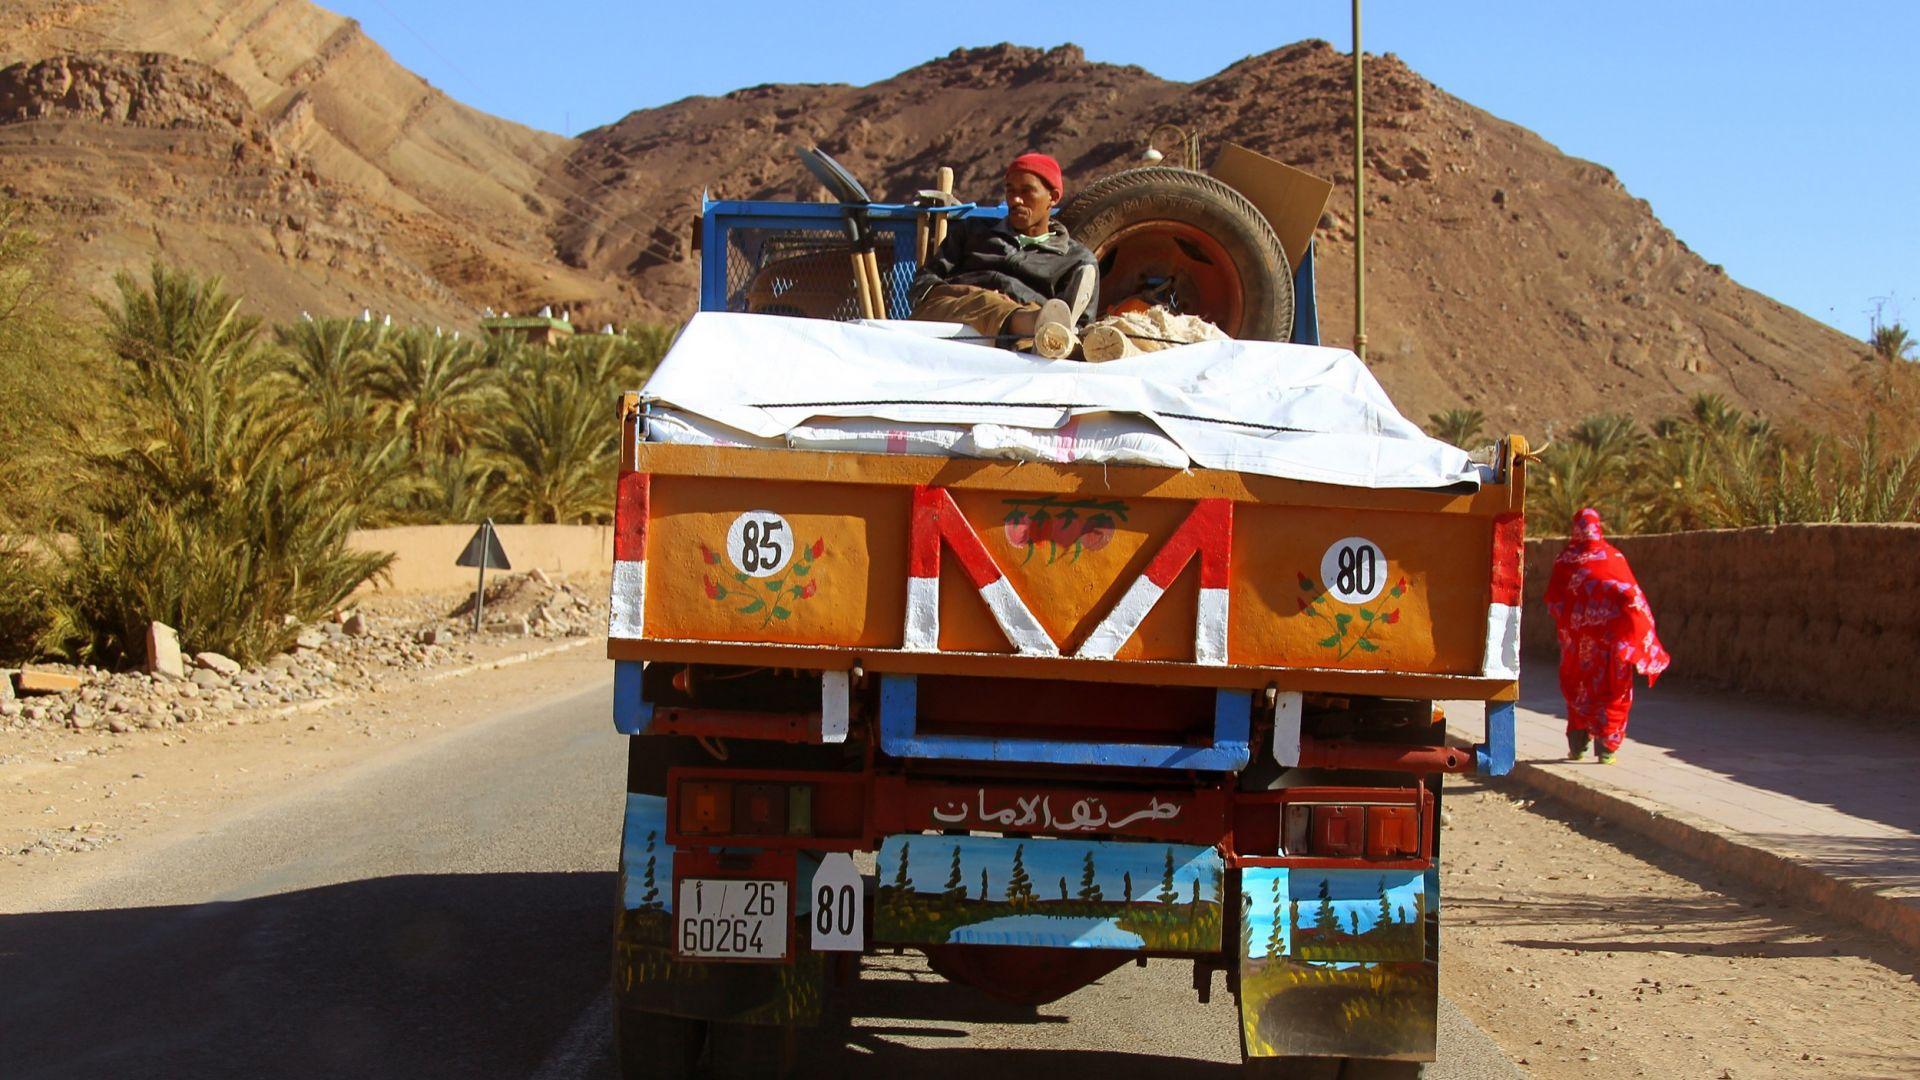 Immagine 56: In Marocco con la Yamaha Super Ténéré